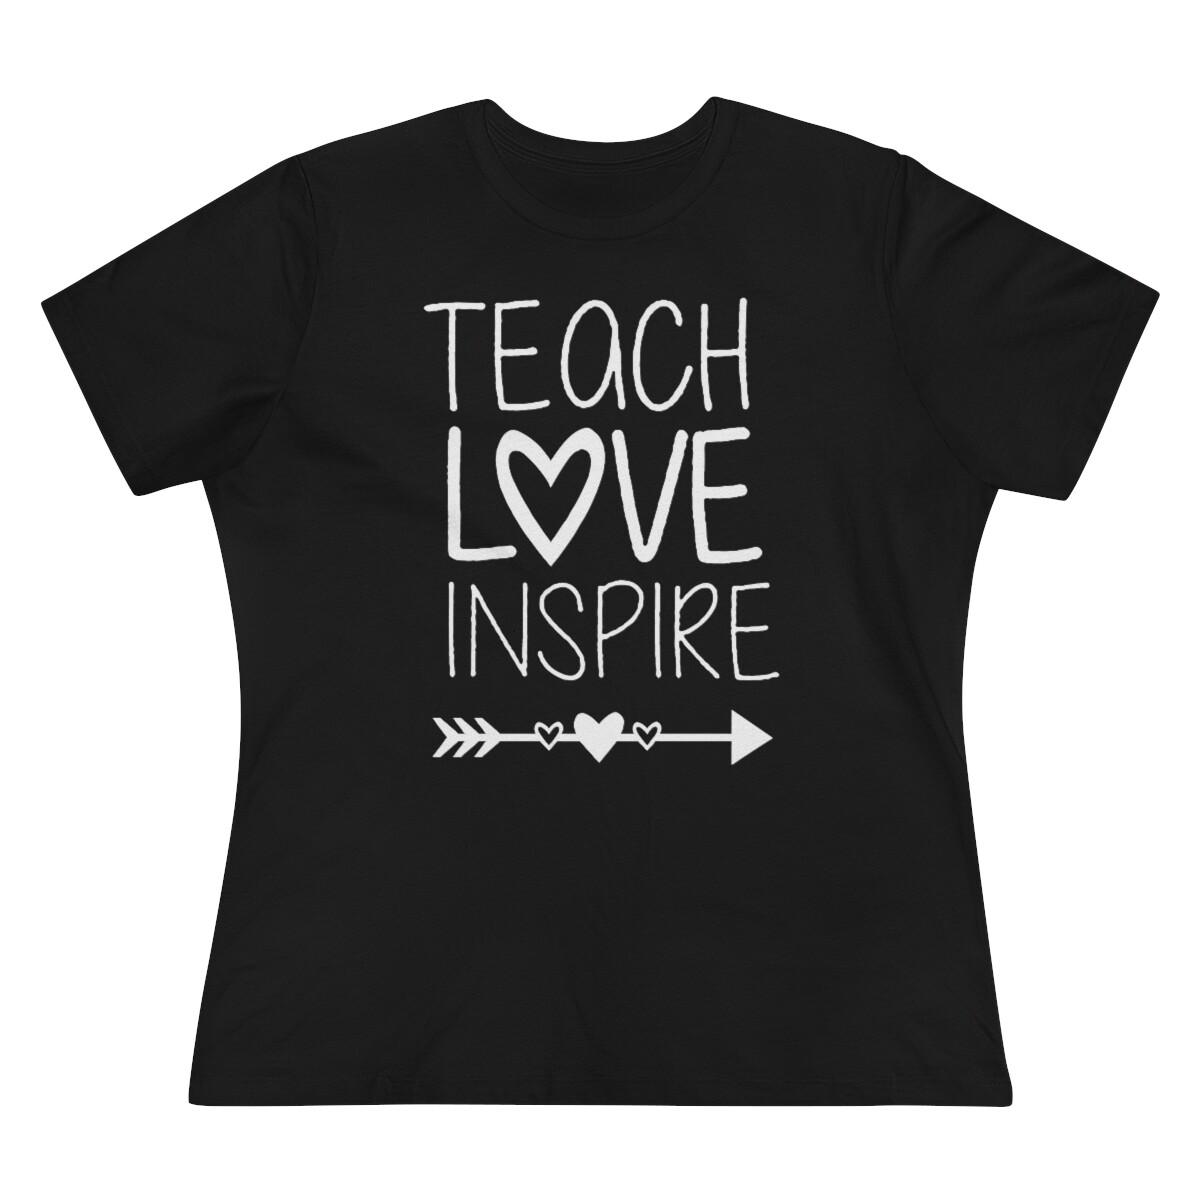 *Teach•Love•Inspire - 6400